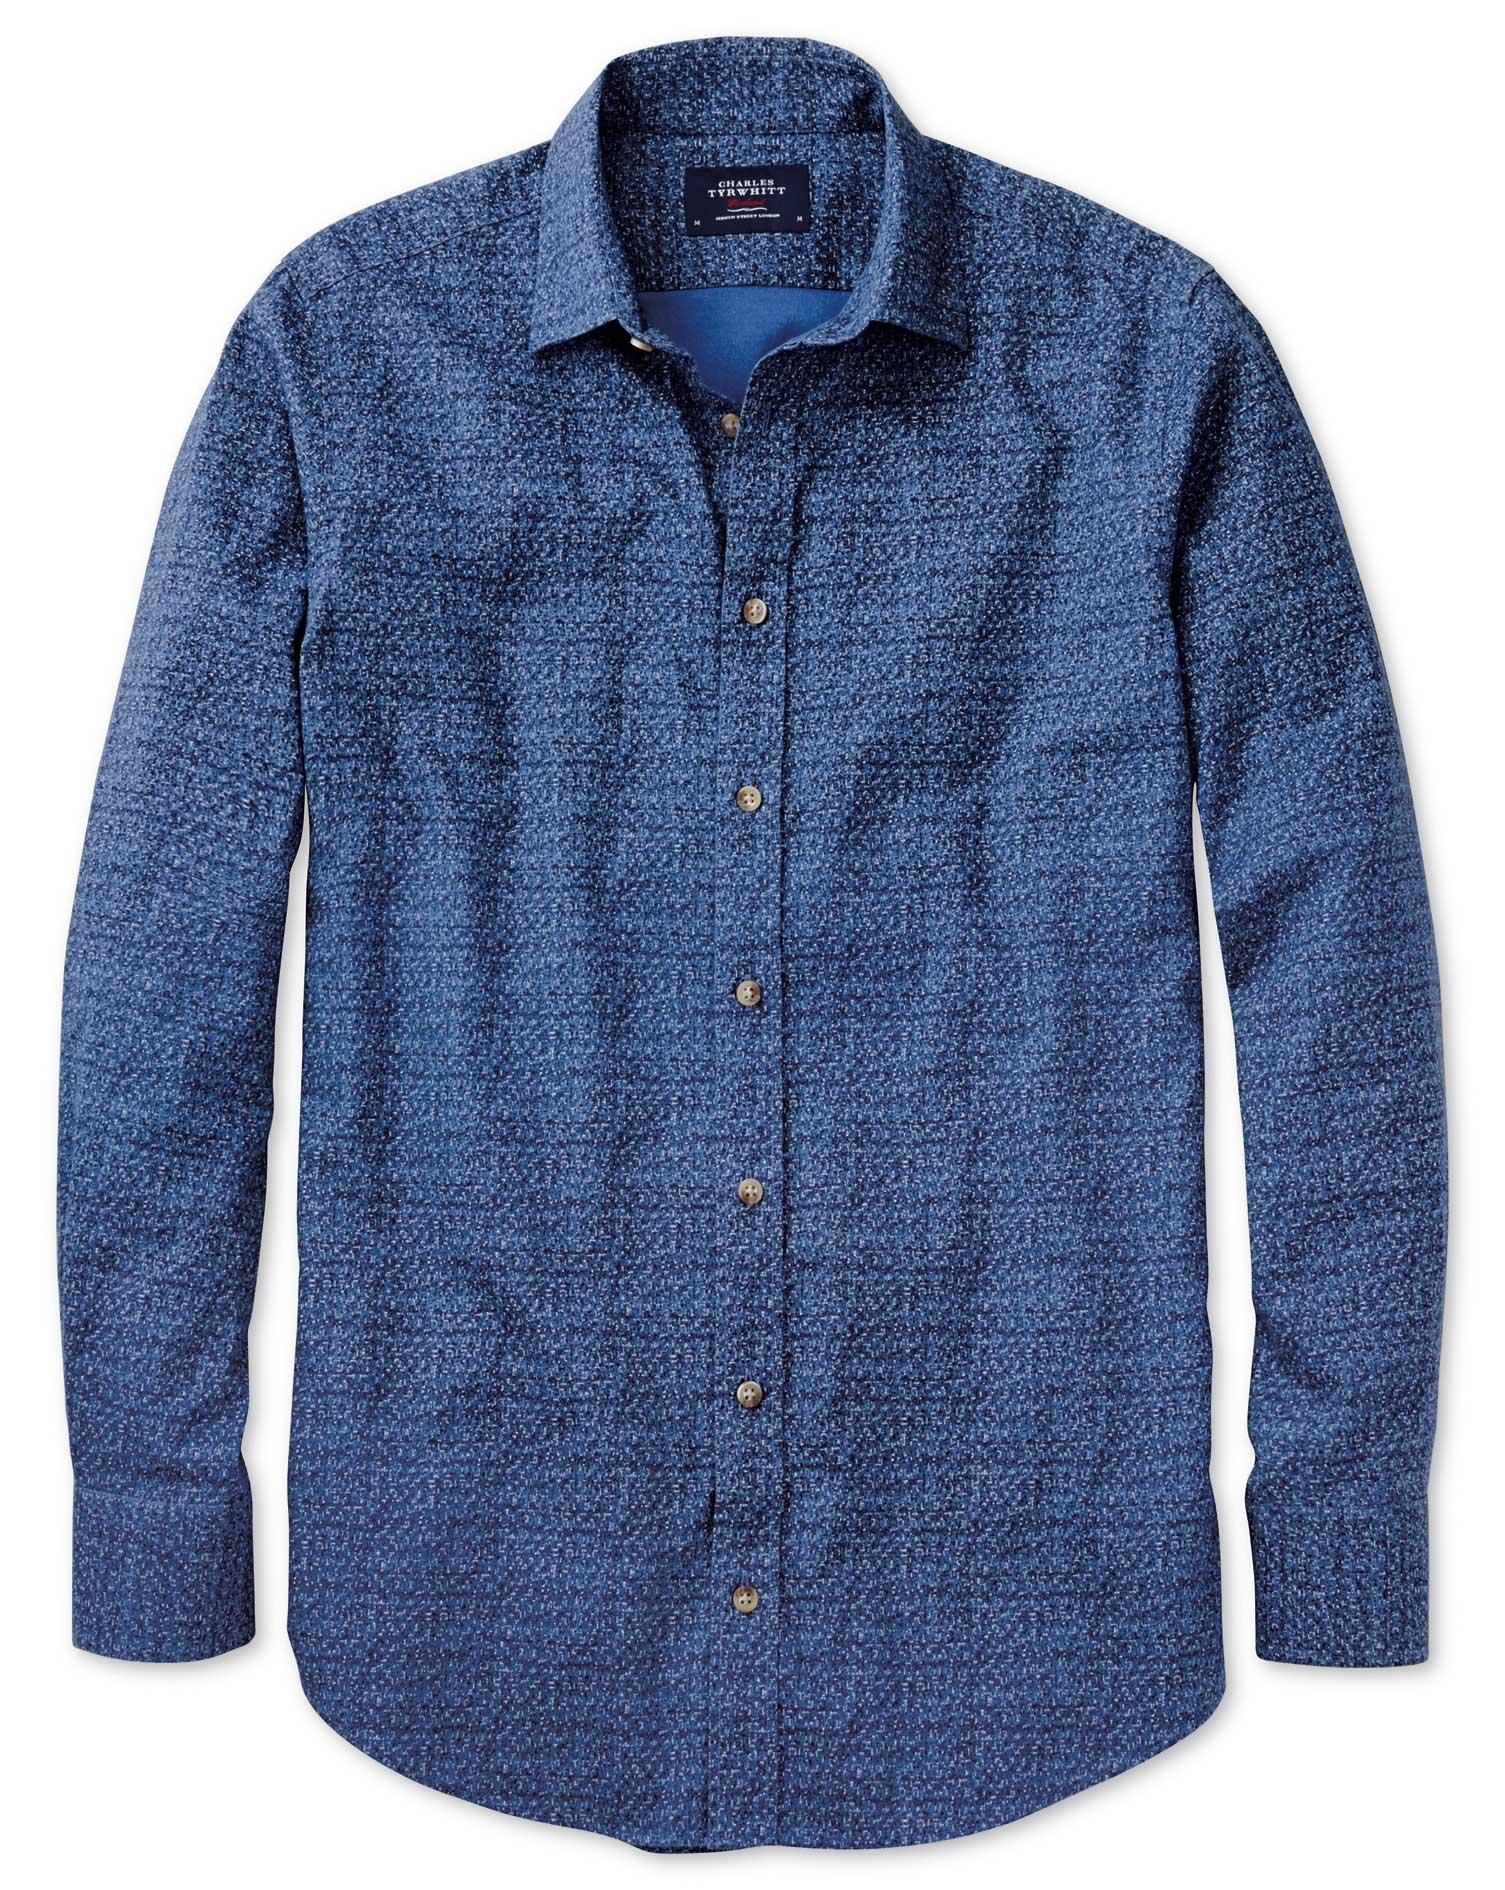 Slim Fit Blue Print Shirt Single Cuff Size Large by Charles Tyrwhitt